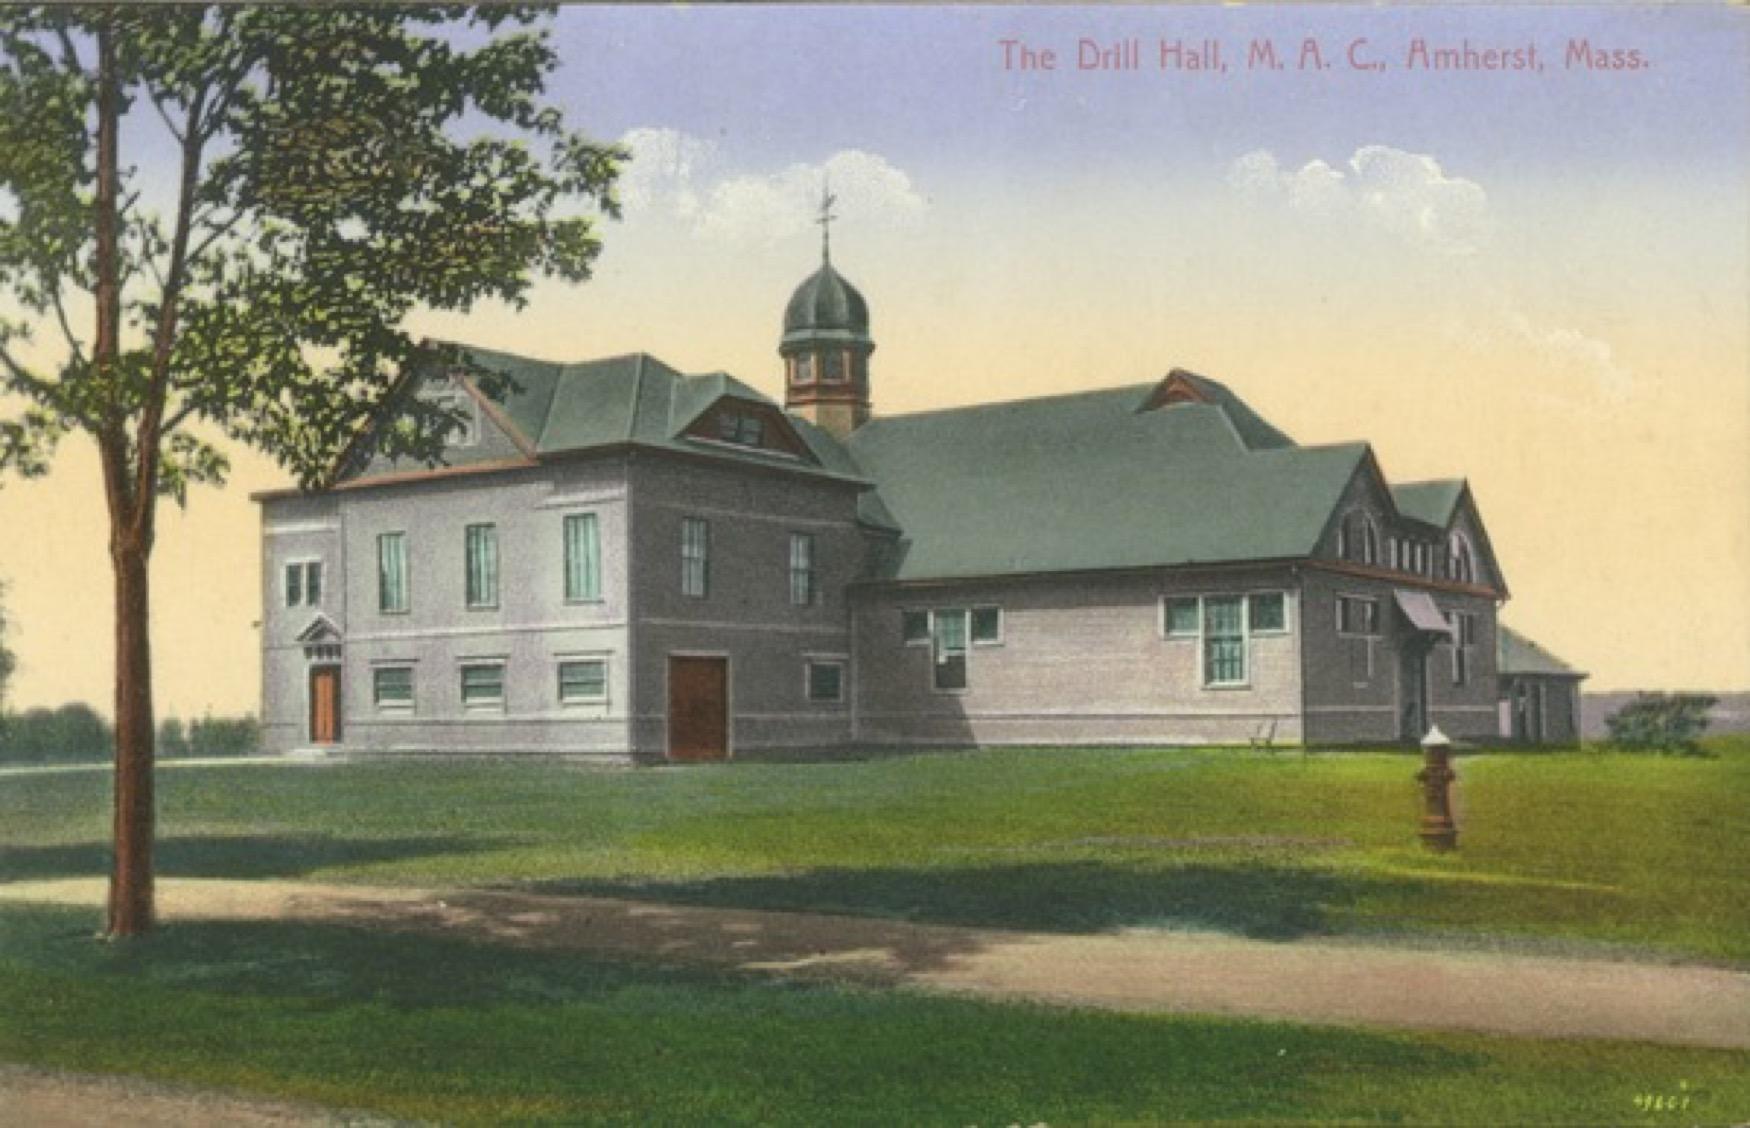 The Drill Hall, M.A.C., Amherst, Mass., ca. 1915